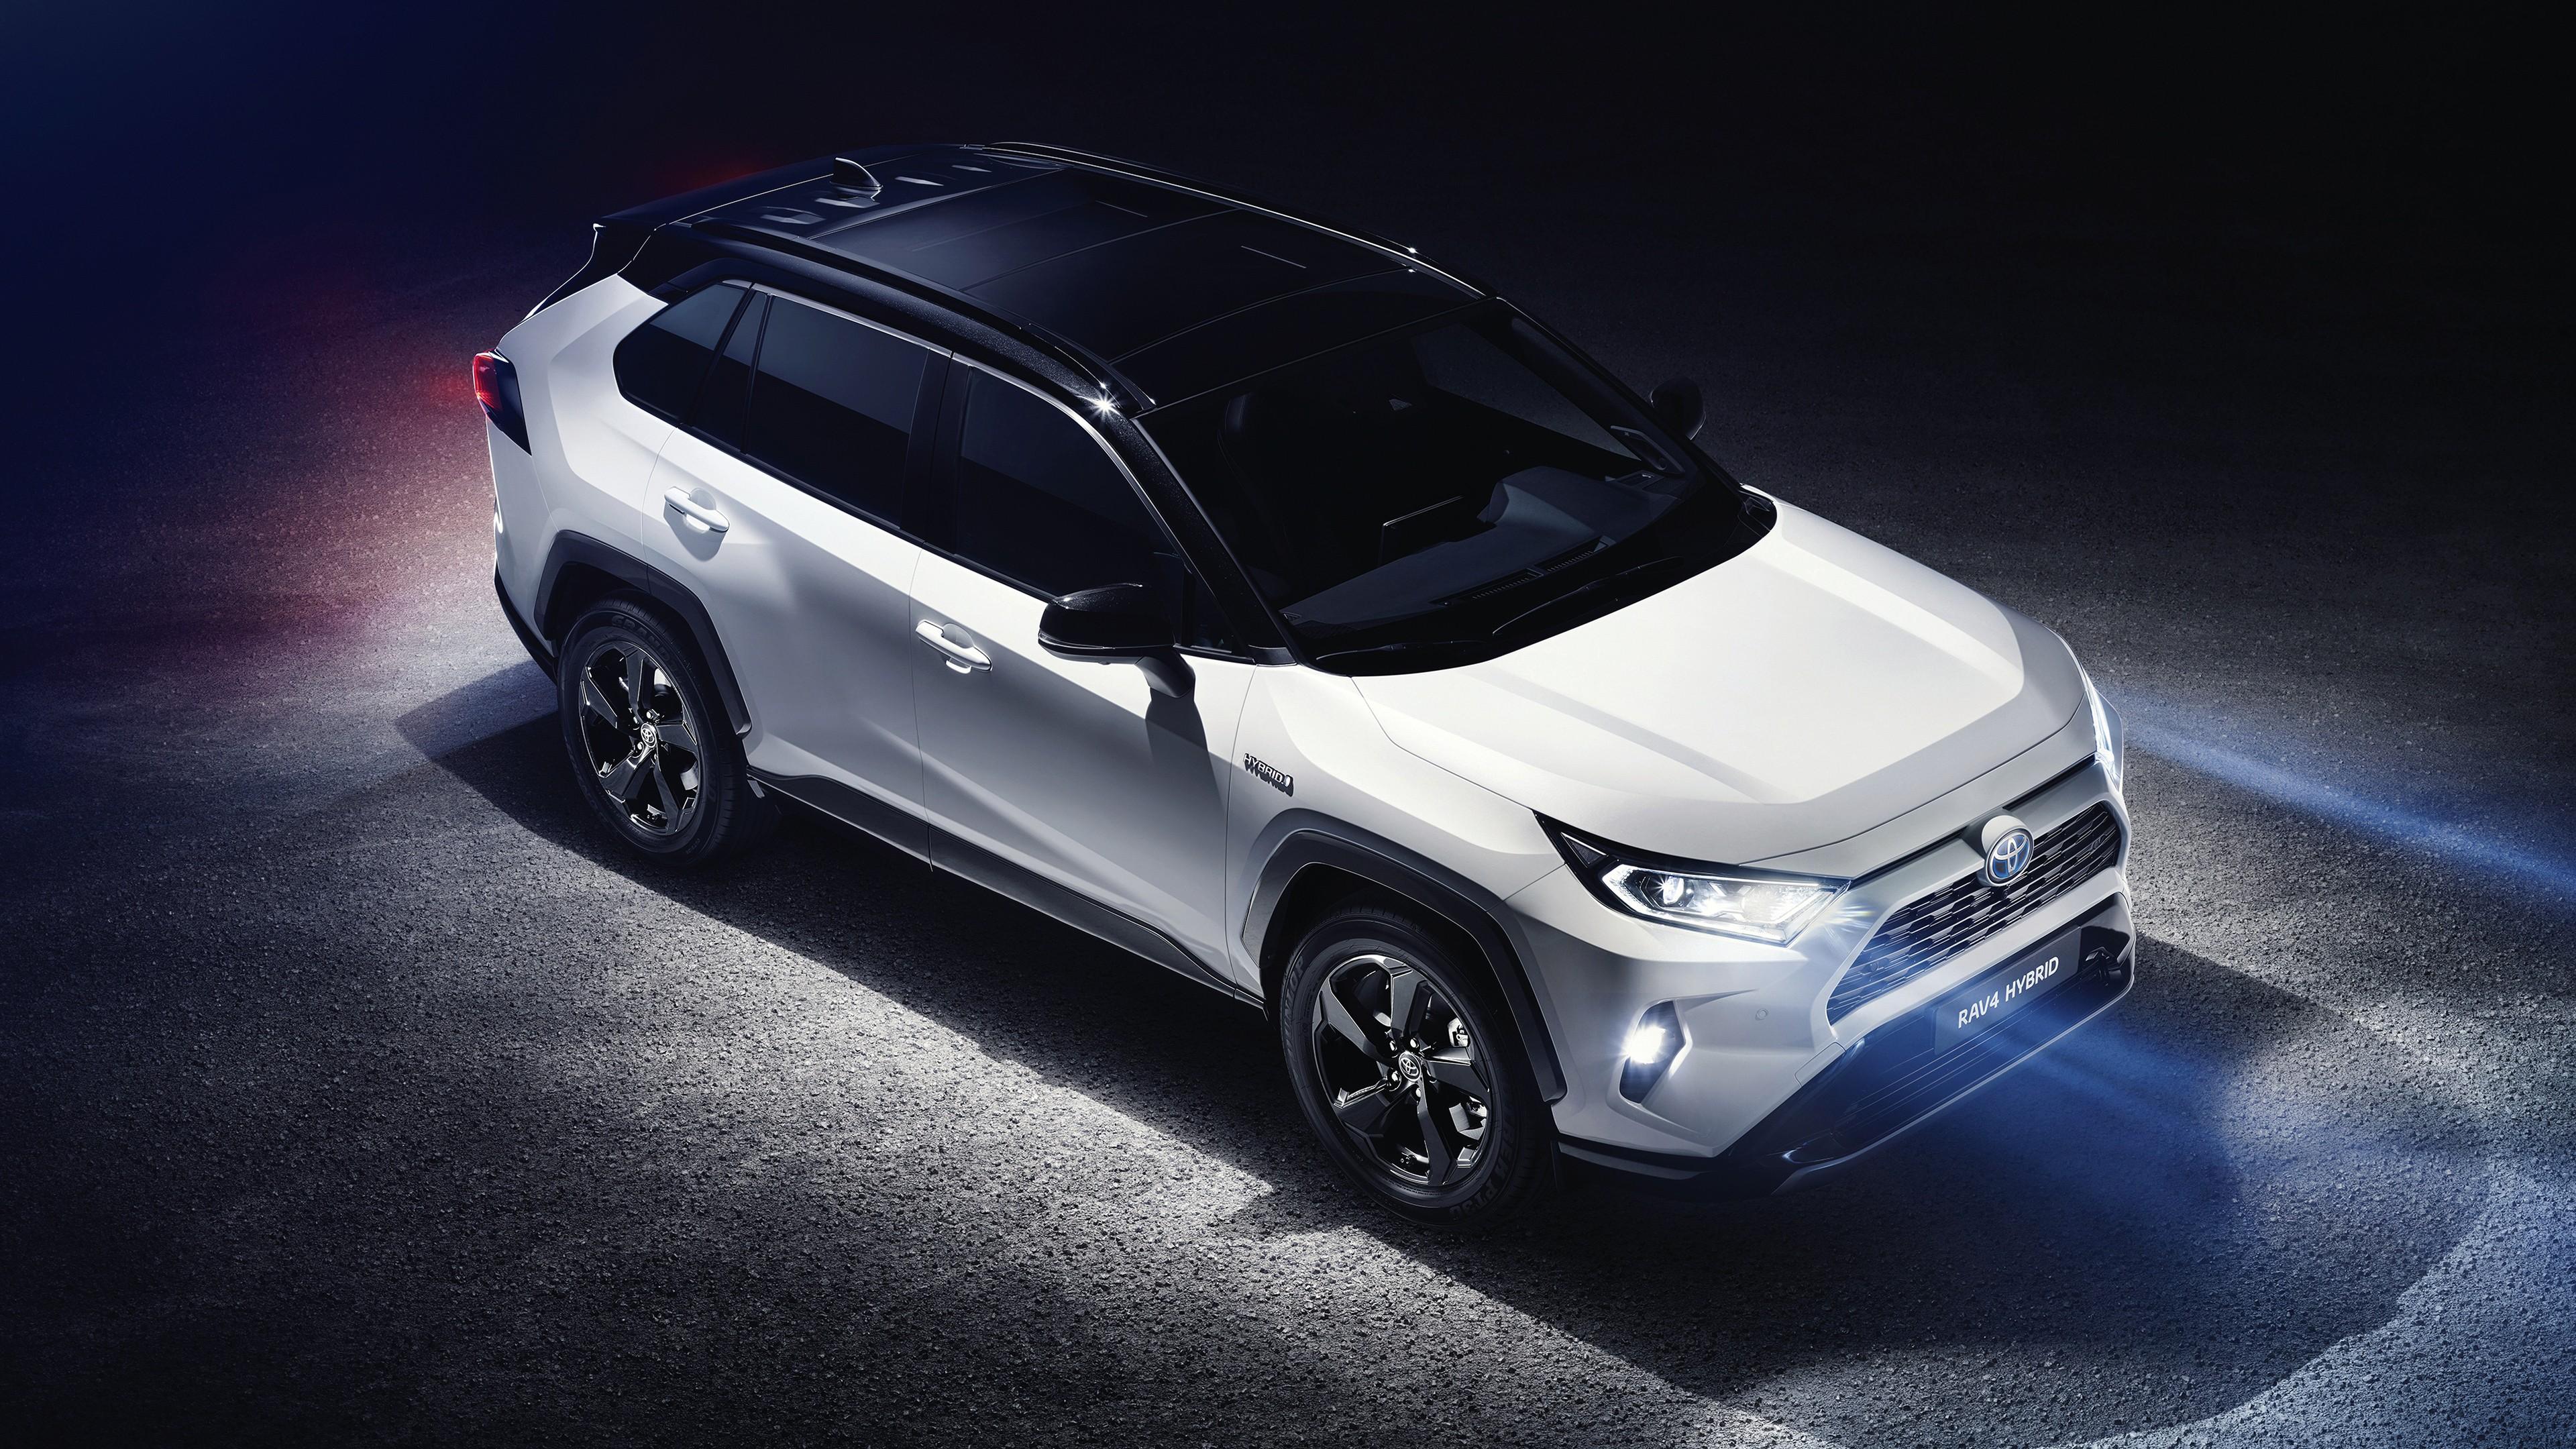 Toyota Camry Hd Wallpapers 2019 Toyota Rav4 Hybrid 4k Wallpapers Hd Wallpapers Id